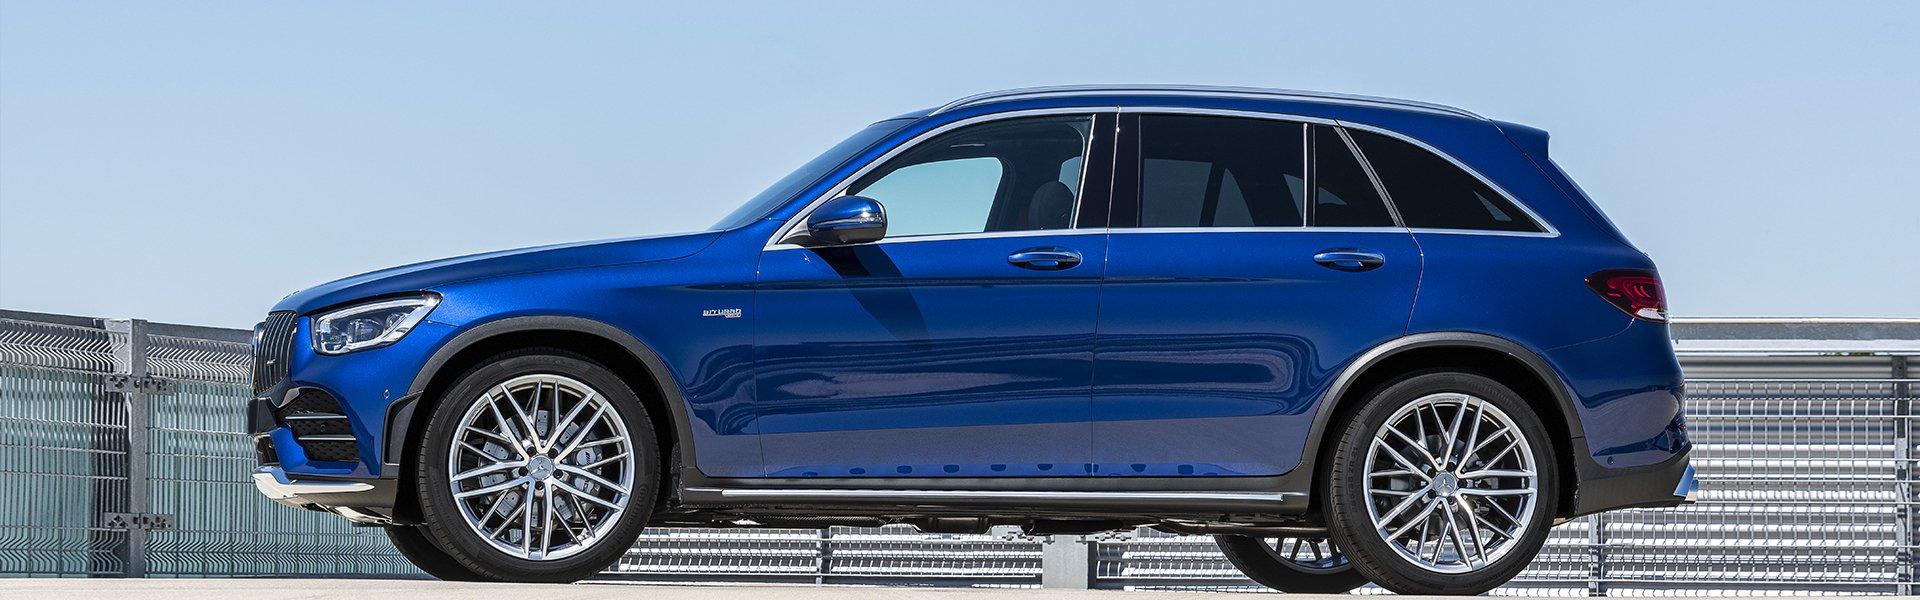 Mercedes-AMG GLC внедорожник